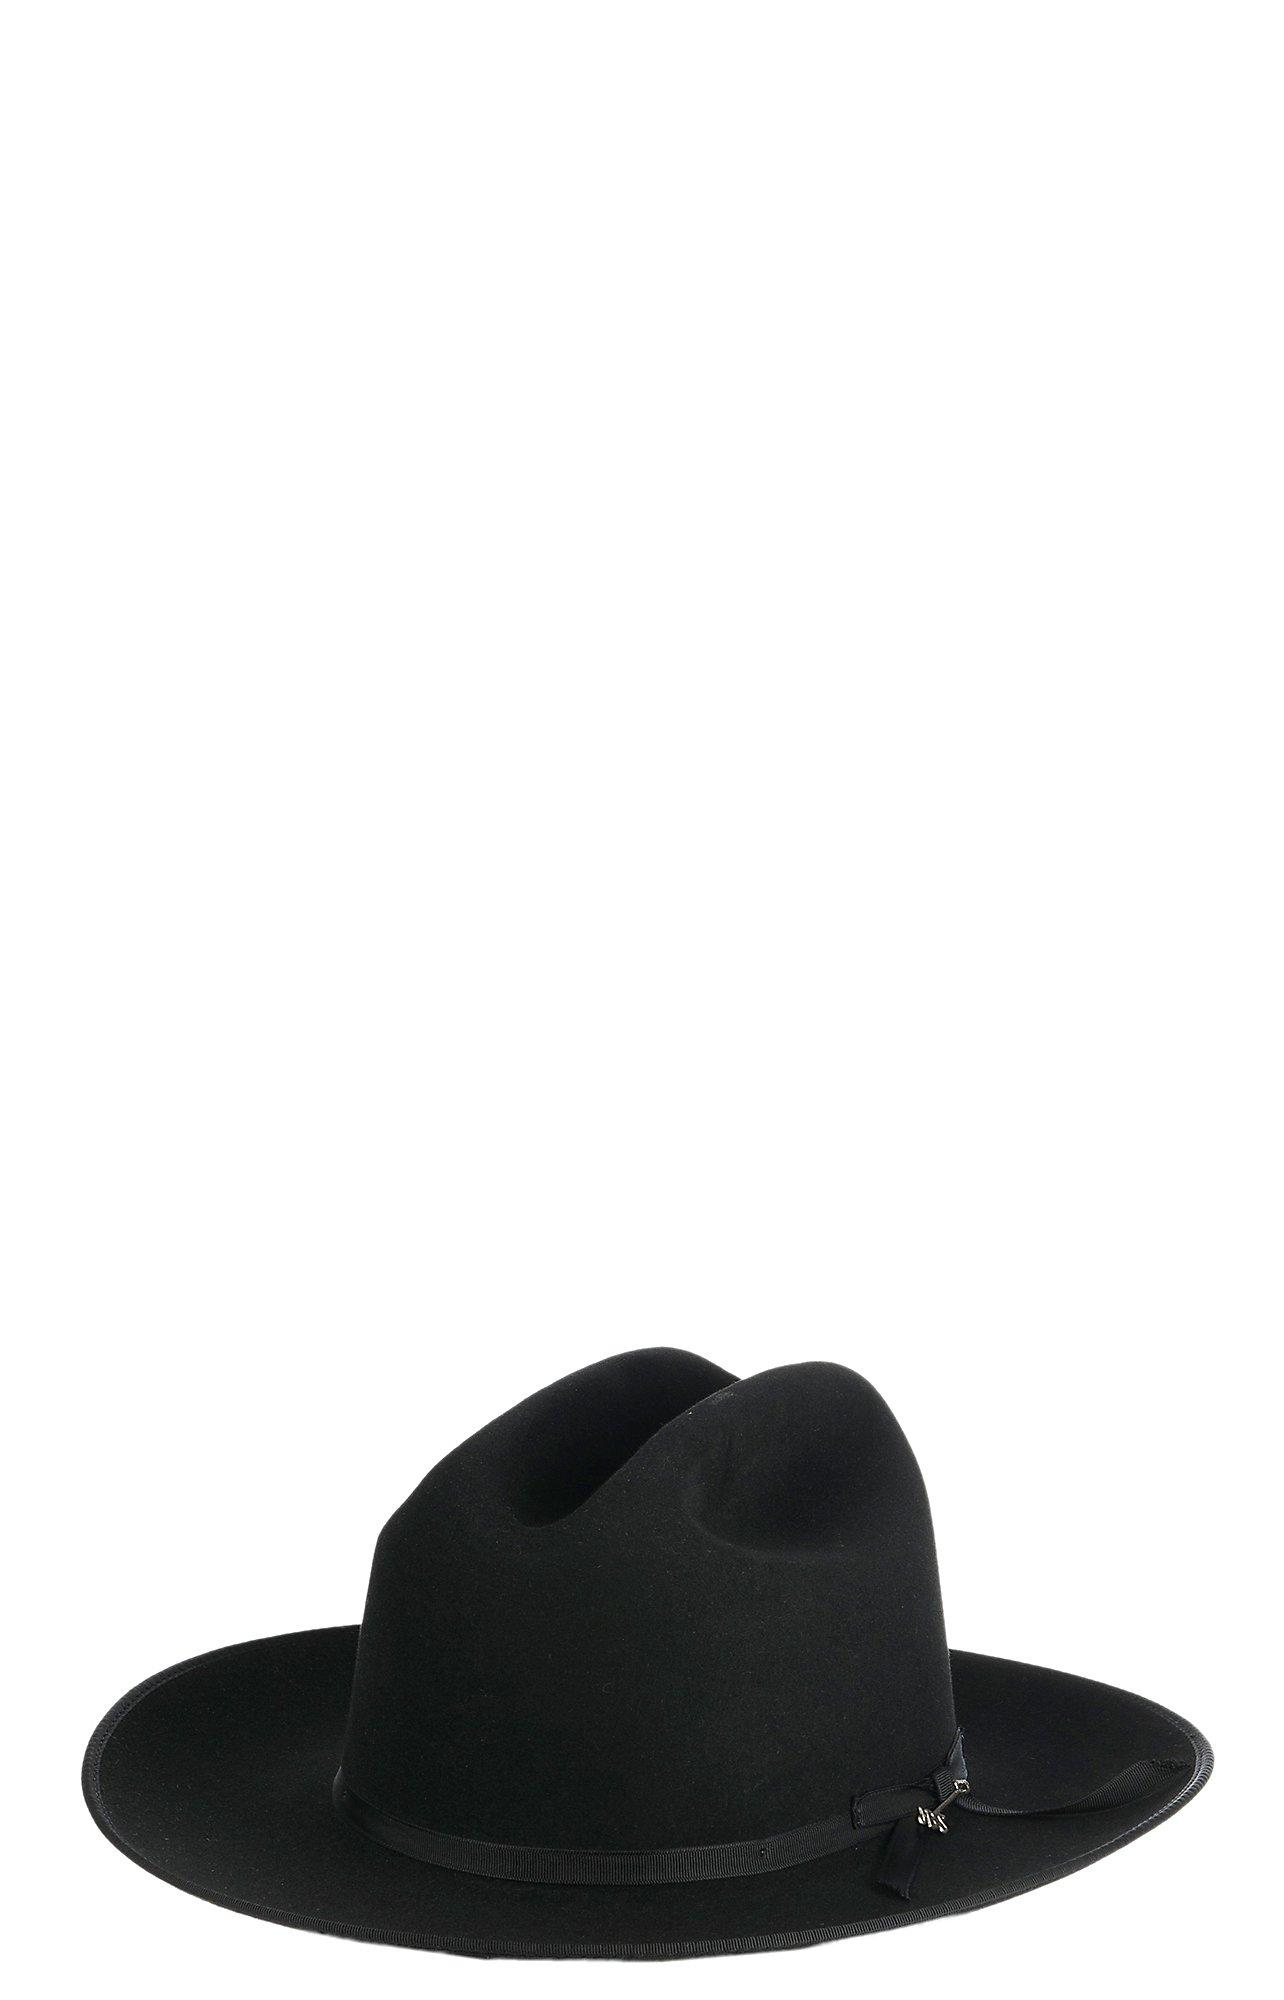 Stetson 6X Openroad Black Felt Cowboy Hat  b2dfca77b95